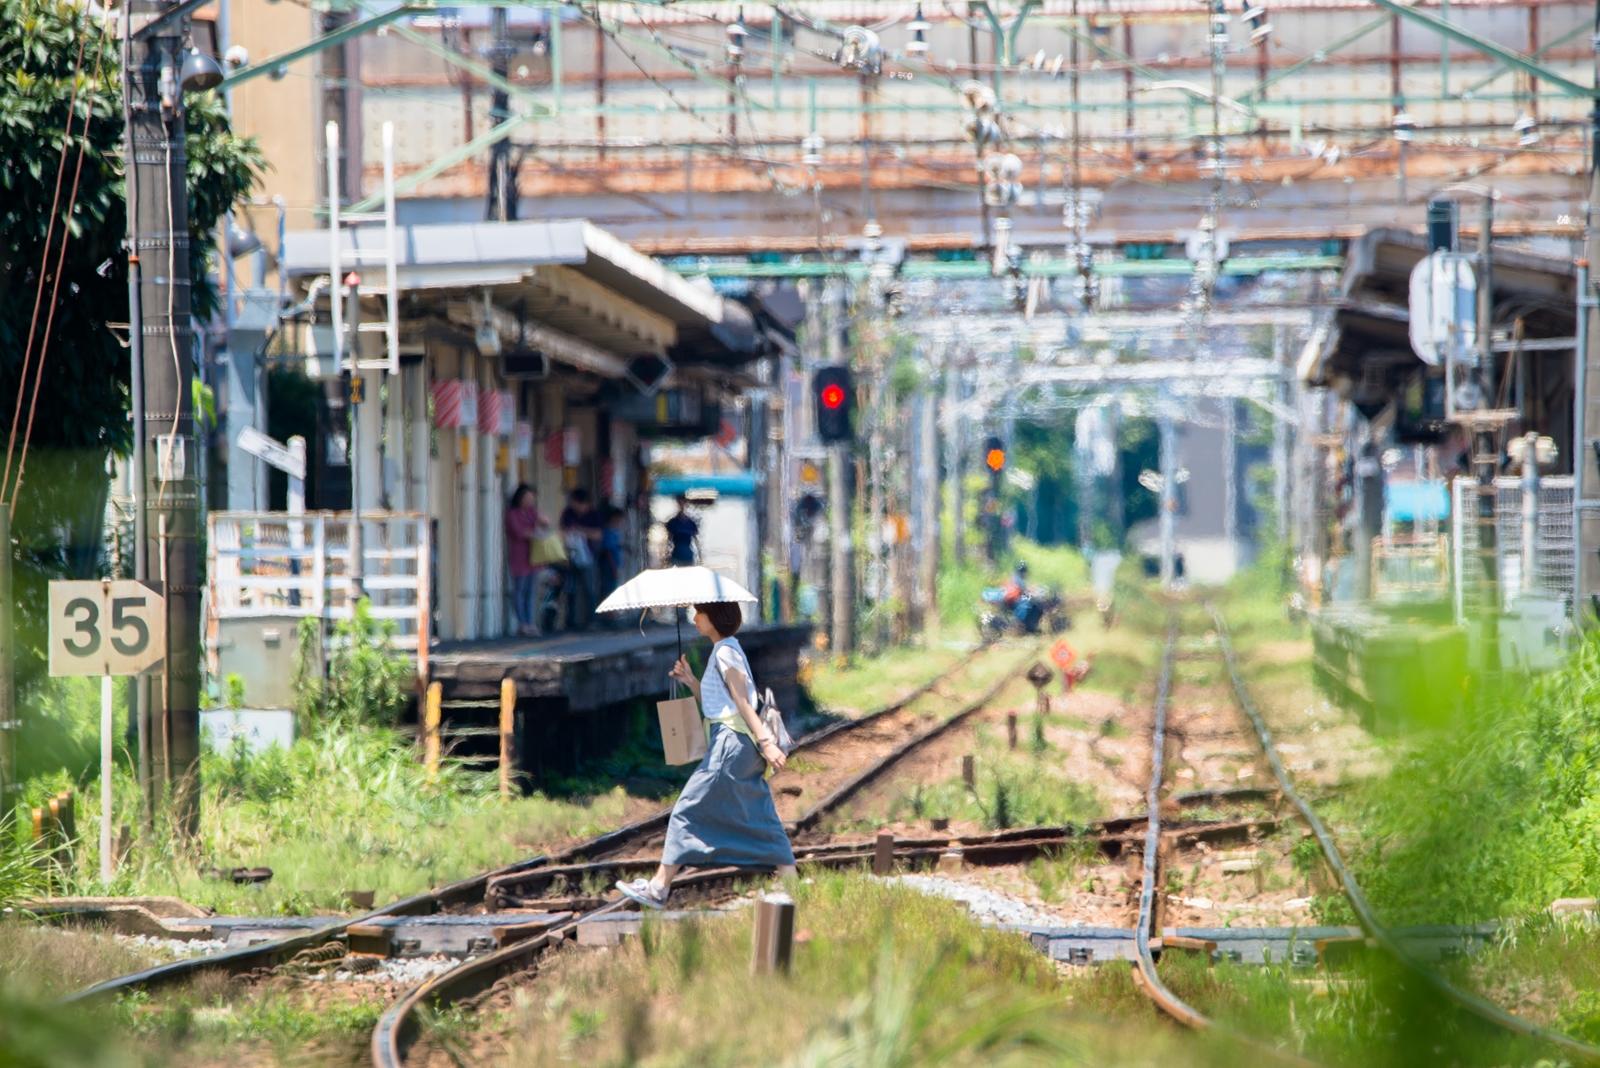 Photo: 夏の宿河原駅  私の住む街の駅です。  #cooljapan #station #summer #nikon #sigma  Nikon D800E SIGMA 150-600mm F5-6.3 DG OS HSM Contemporary